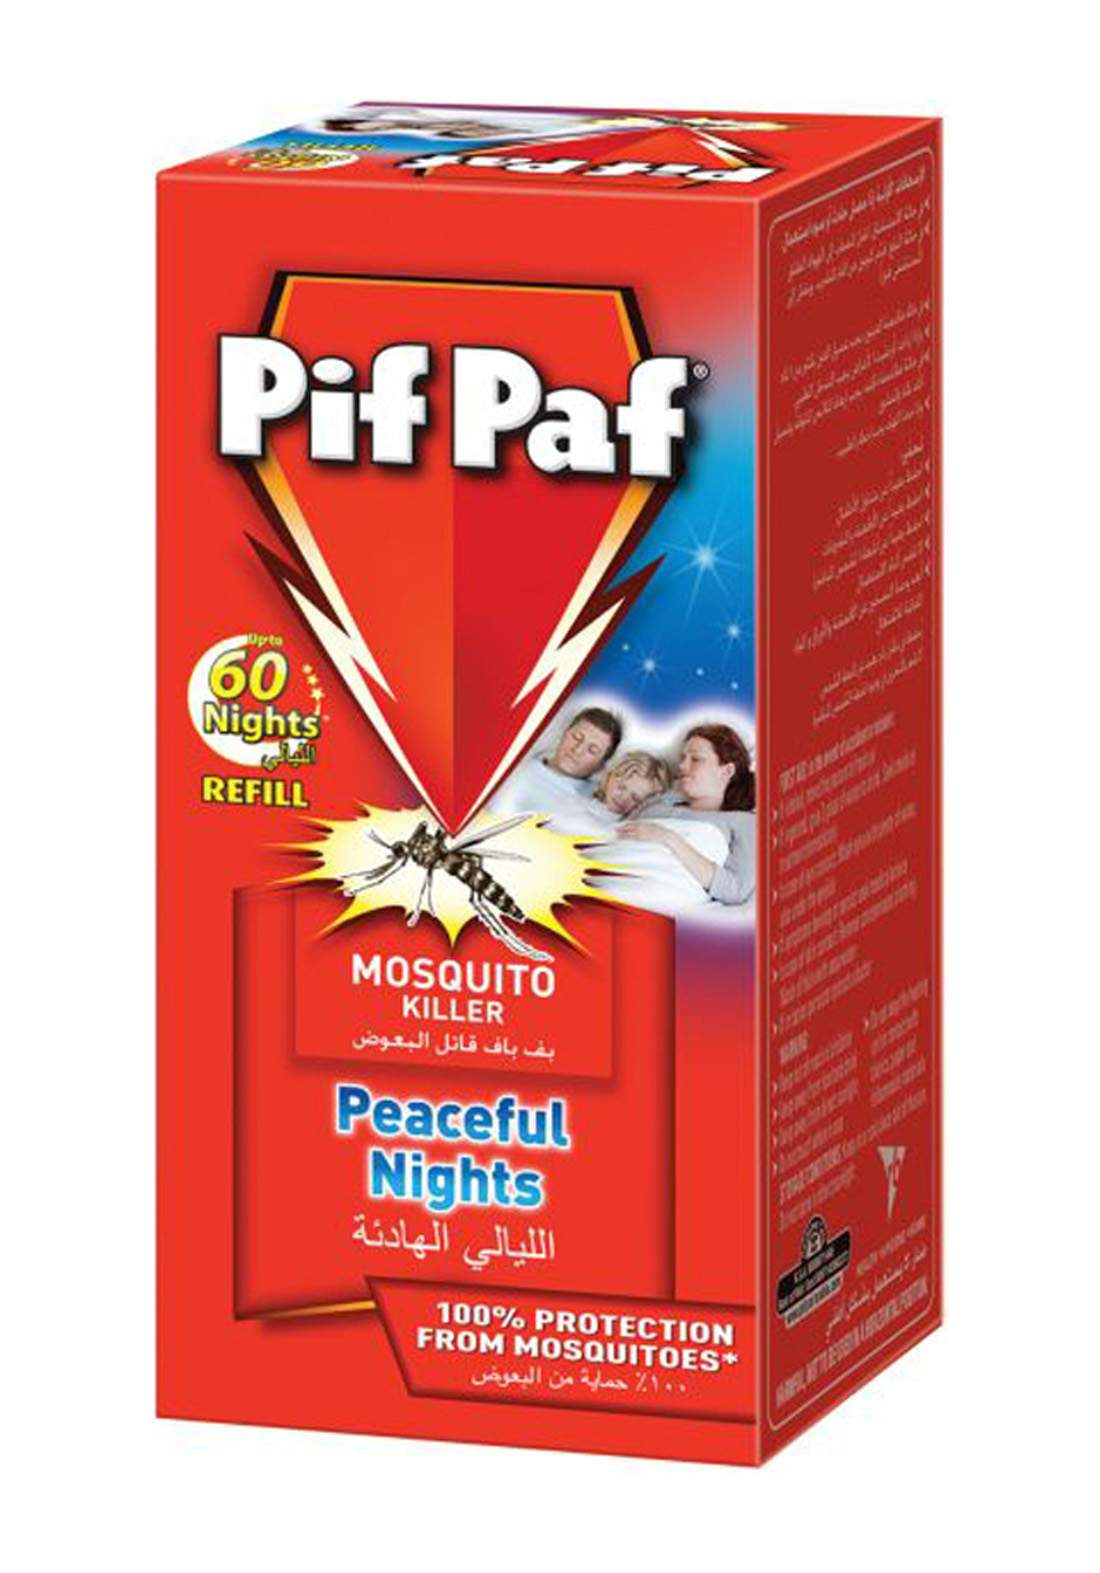 Pif Paf Power Gard Liquid Mosquito Killer 60 Nights Electrical Plug-In Refill 45mlمبيد الحشرات